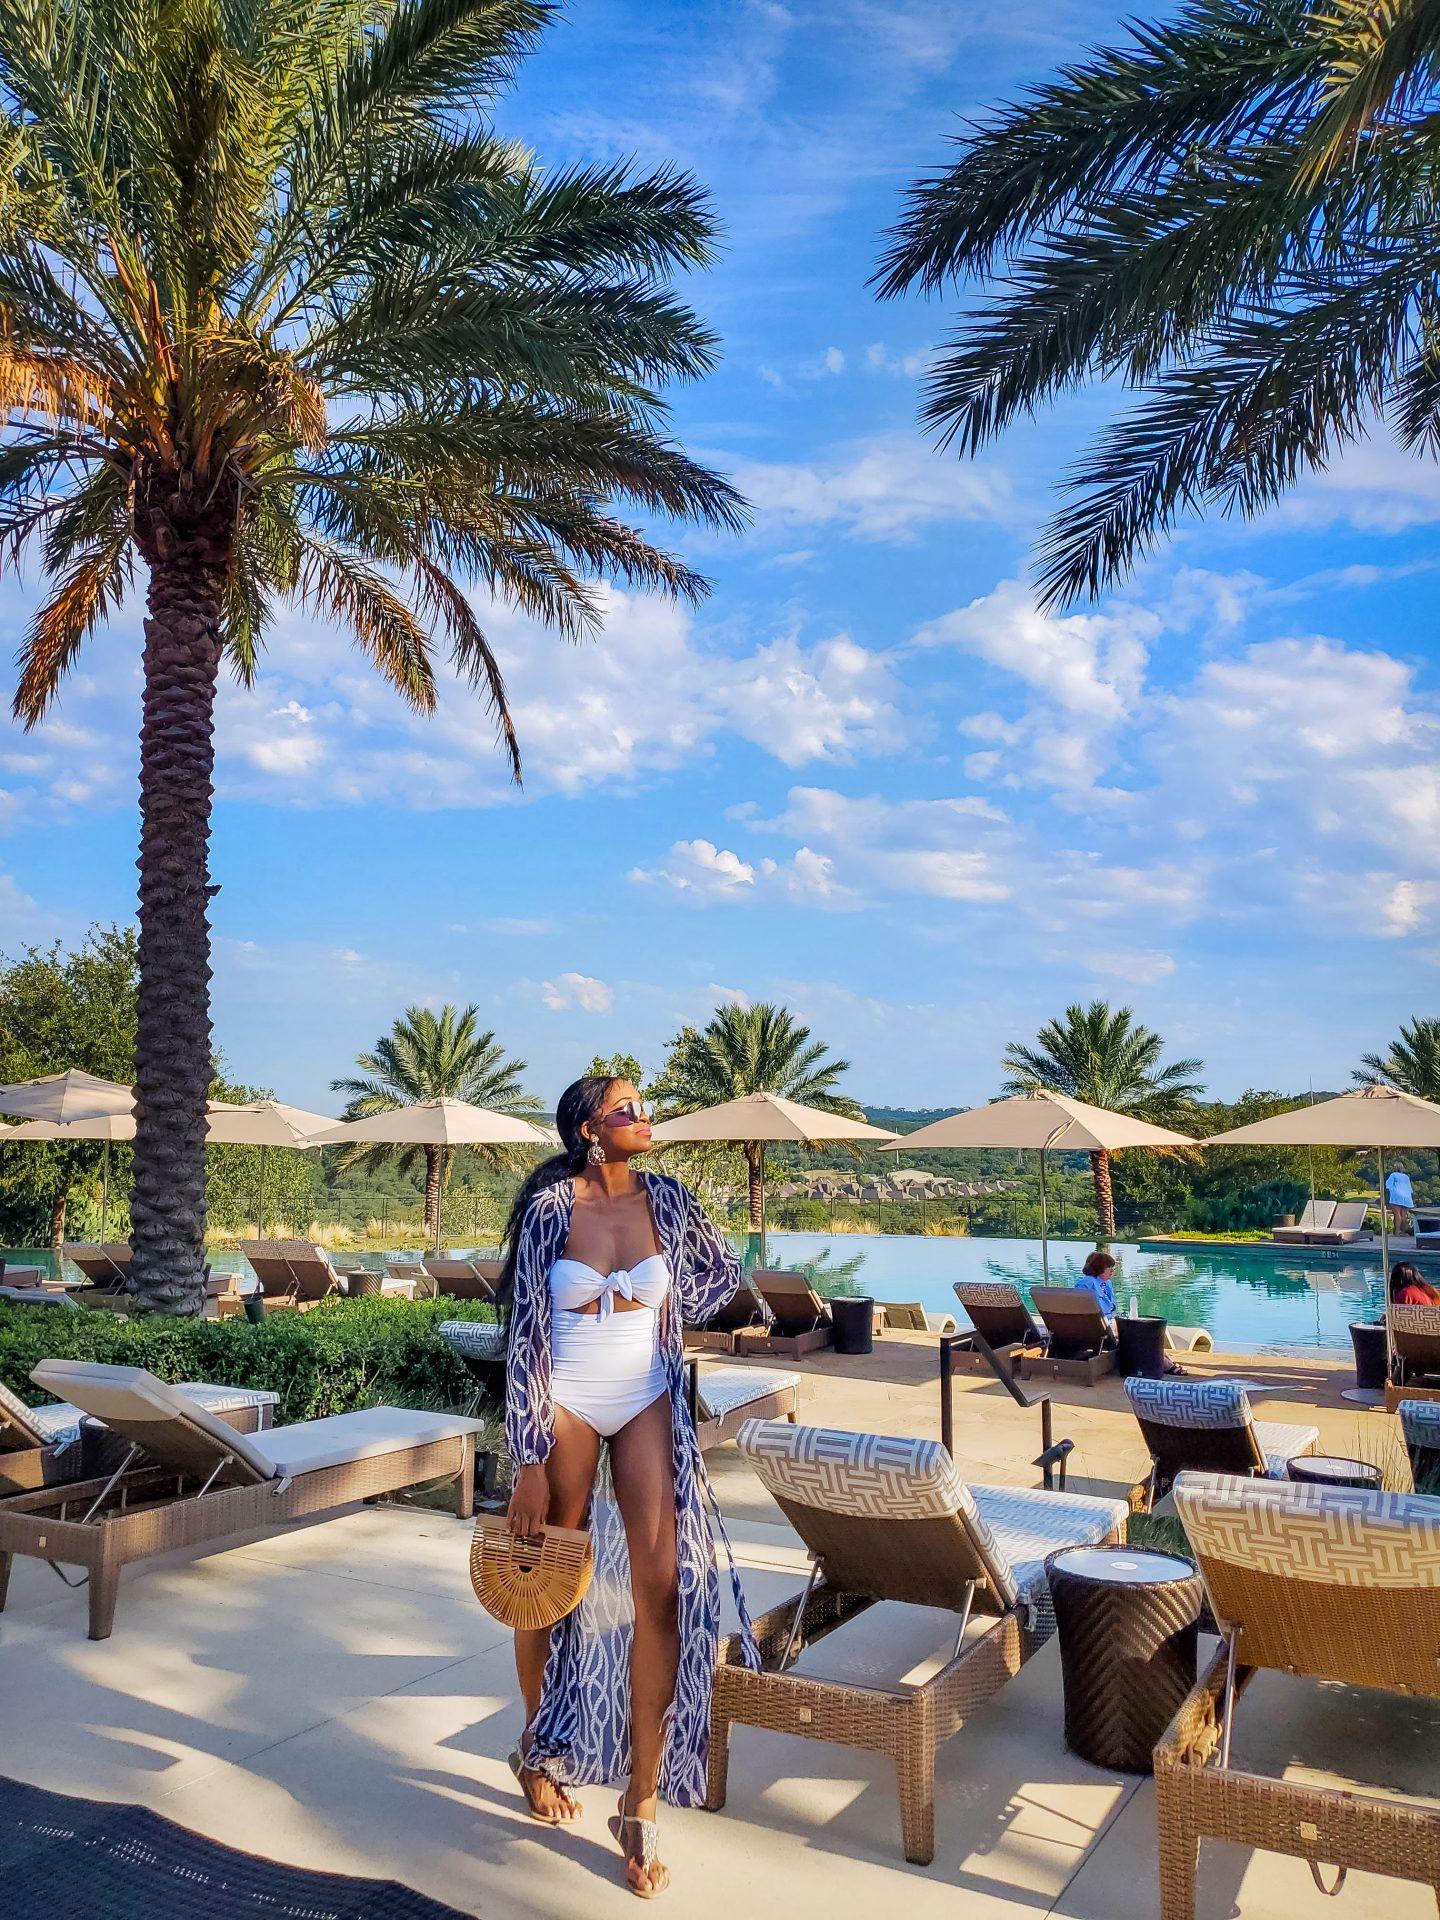 La Cantera Resort San Antonio The Most Tropical Vacation Spots in Texas You Must Visit